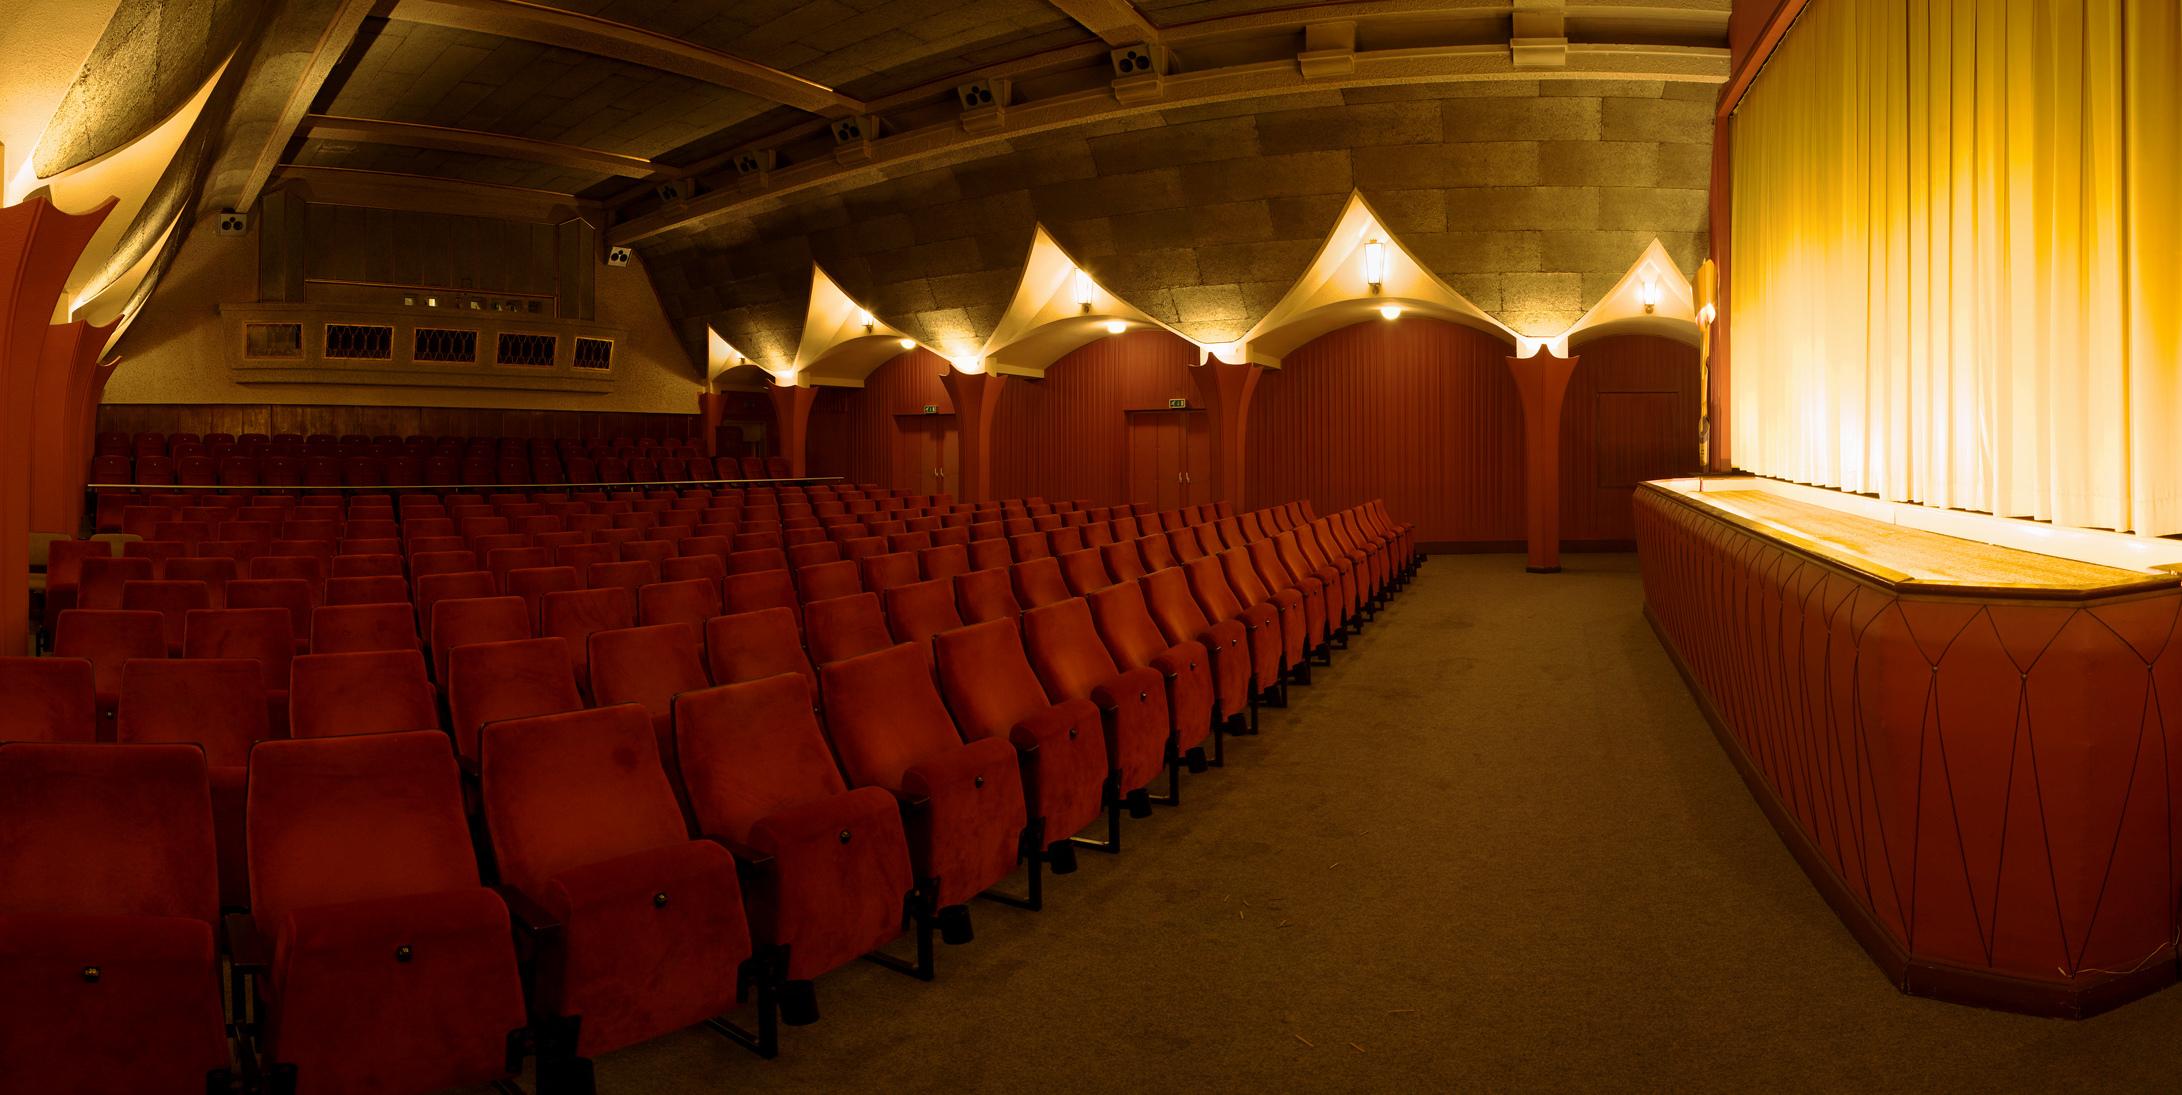 Türkheim – Filmhaus Huber